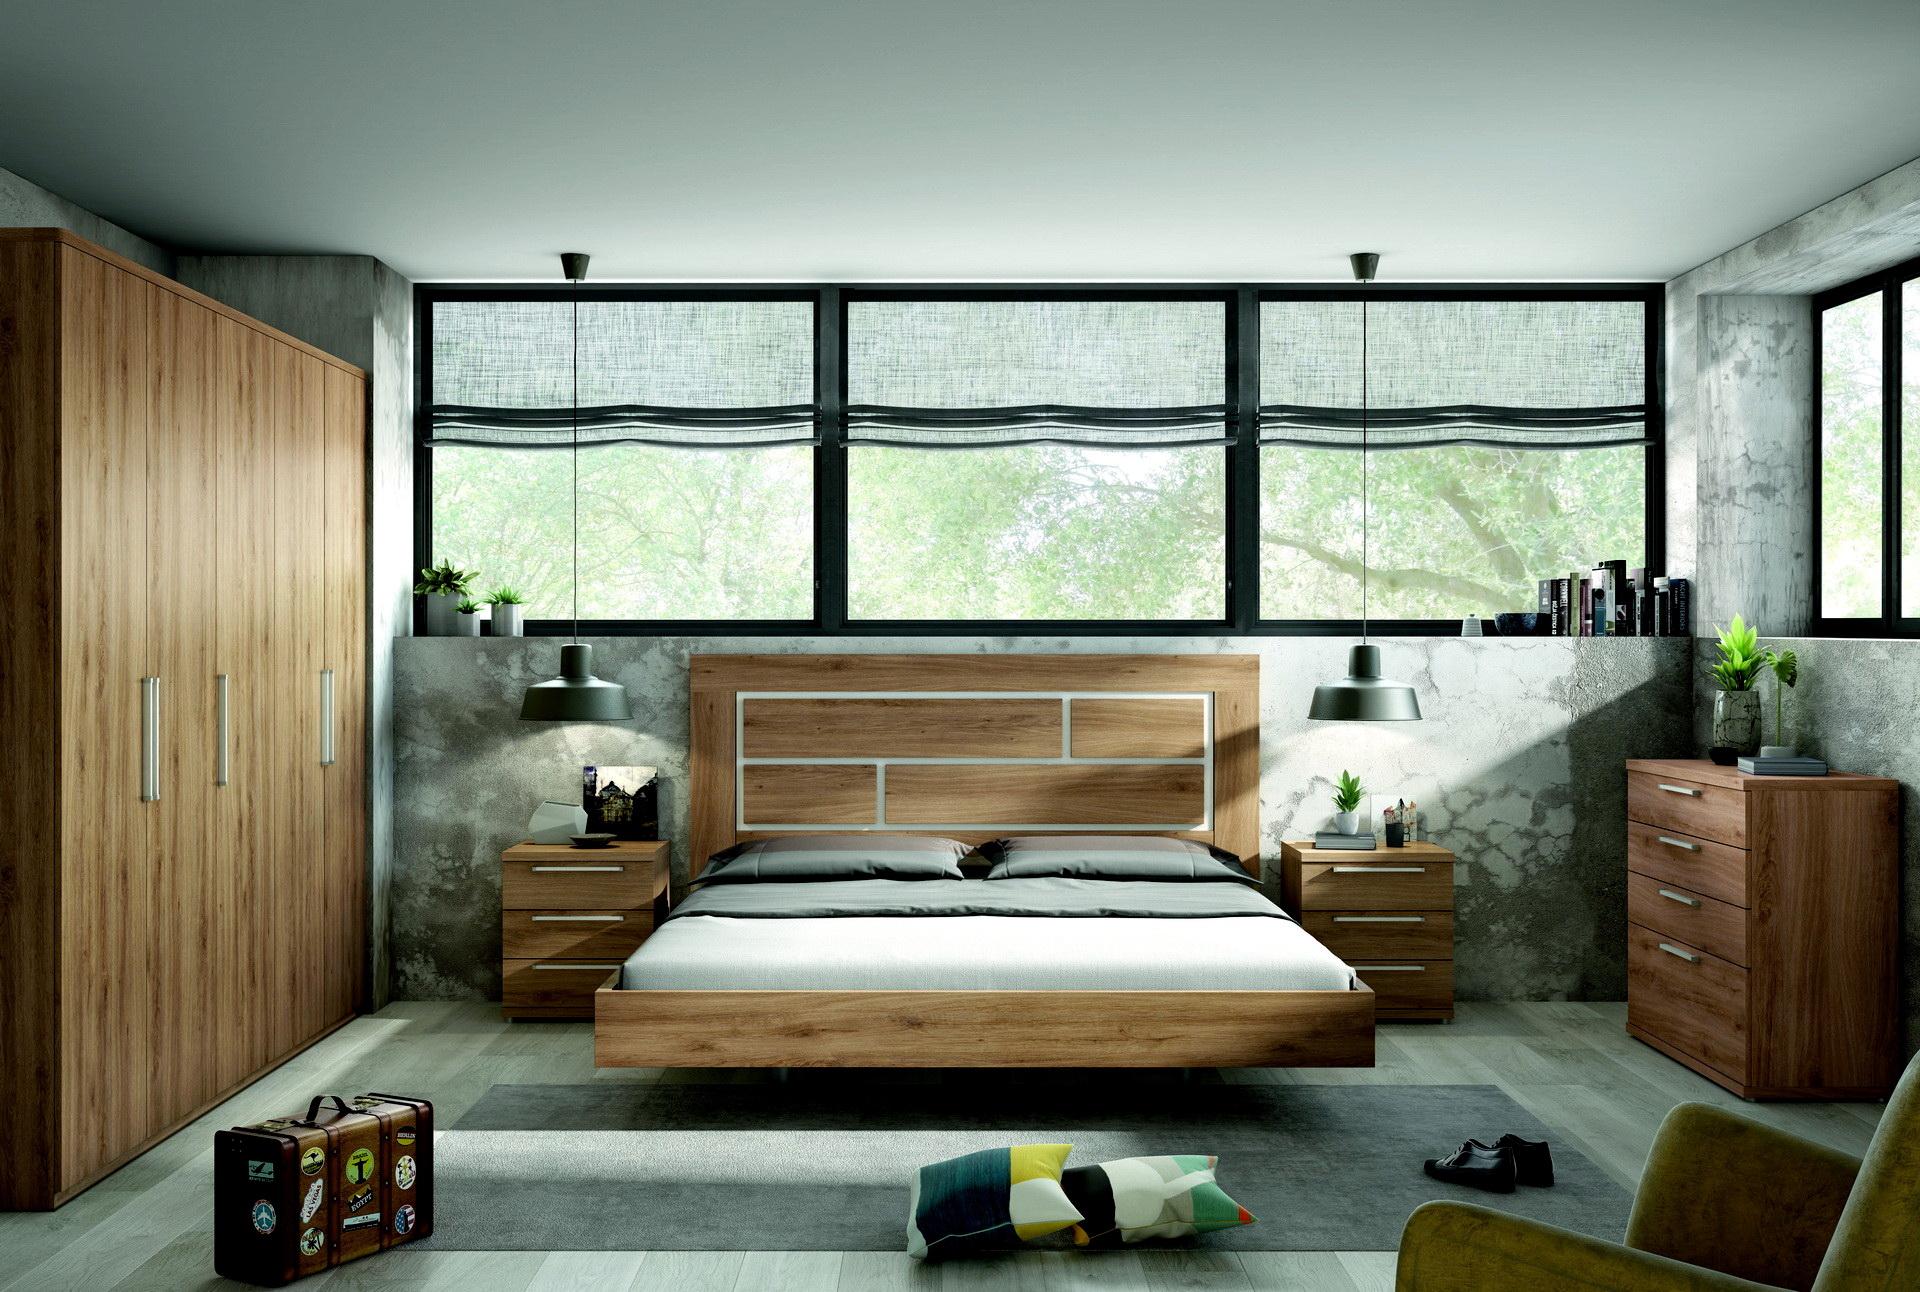 Kronos3 dormitorios low cost by ramis en muebles anto n le n - Muebles low cost ...